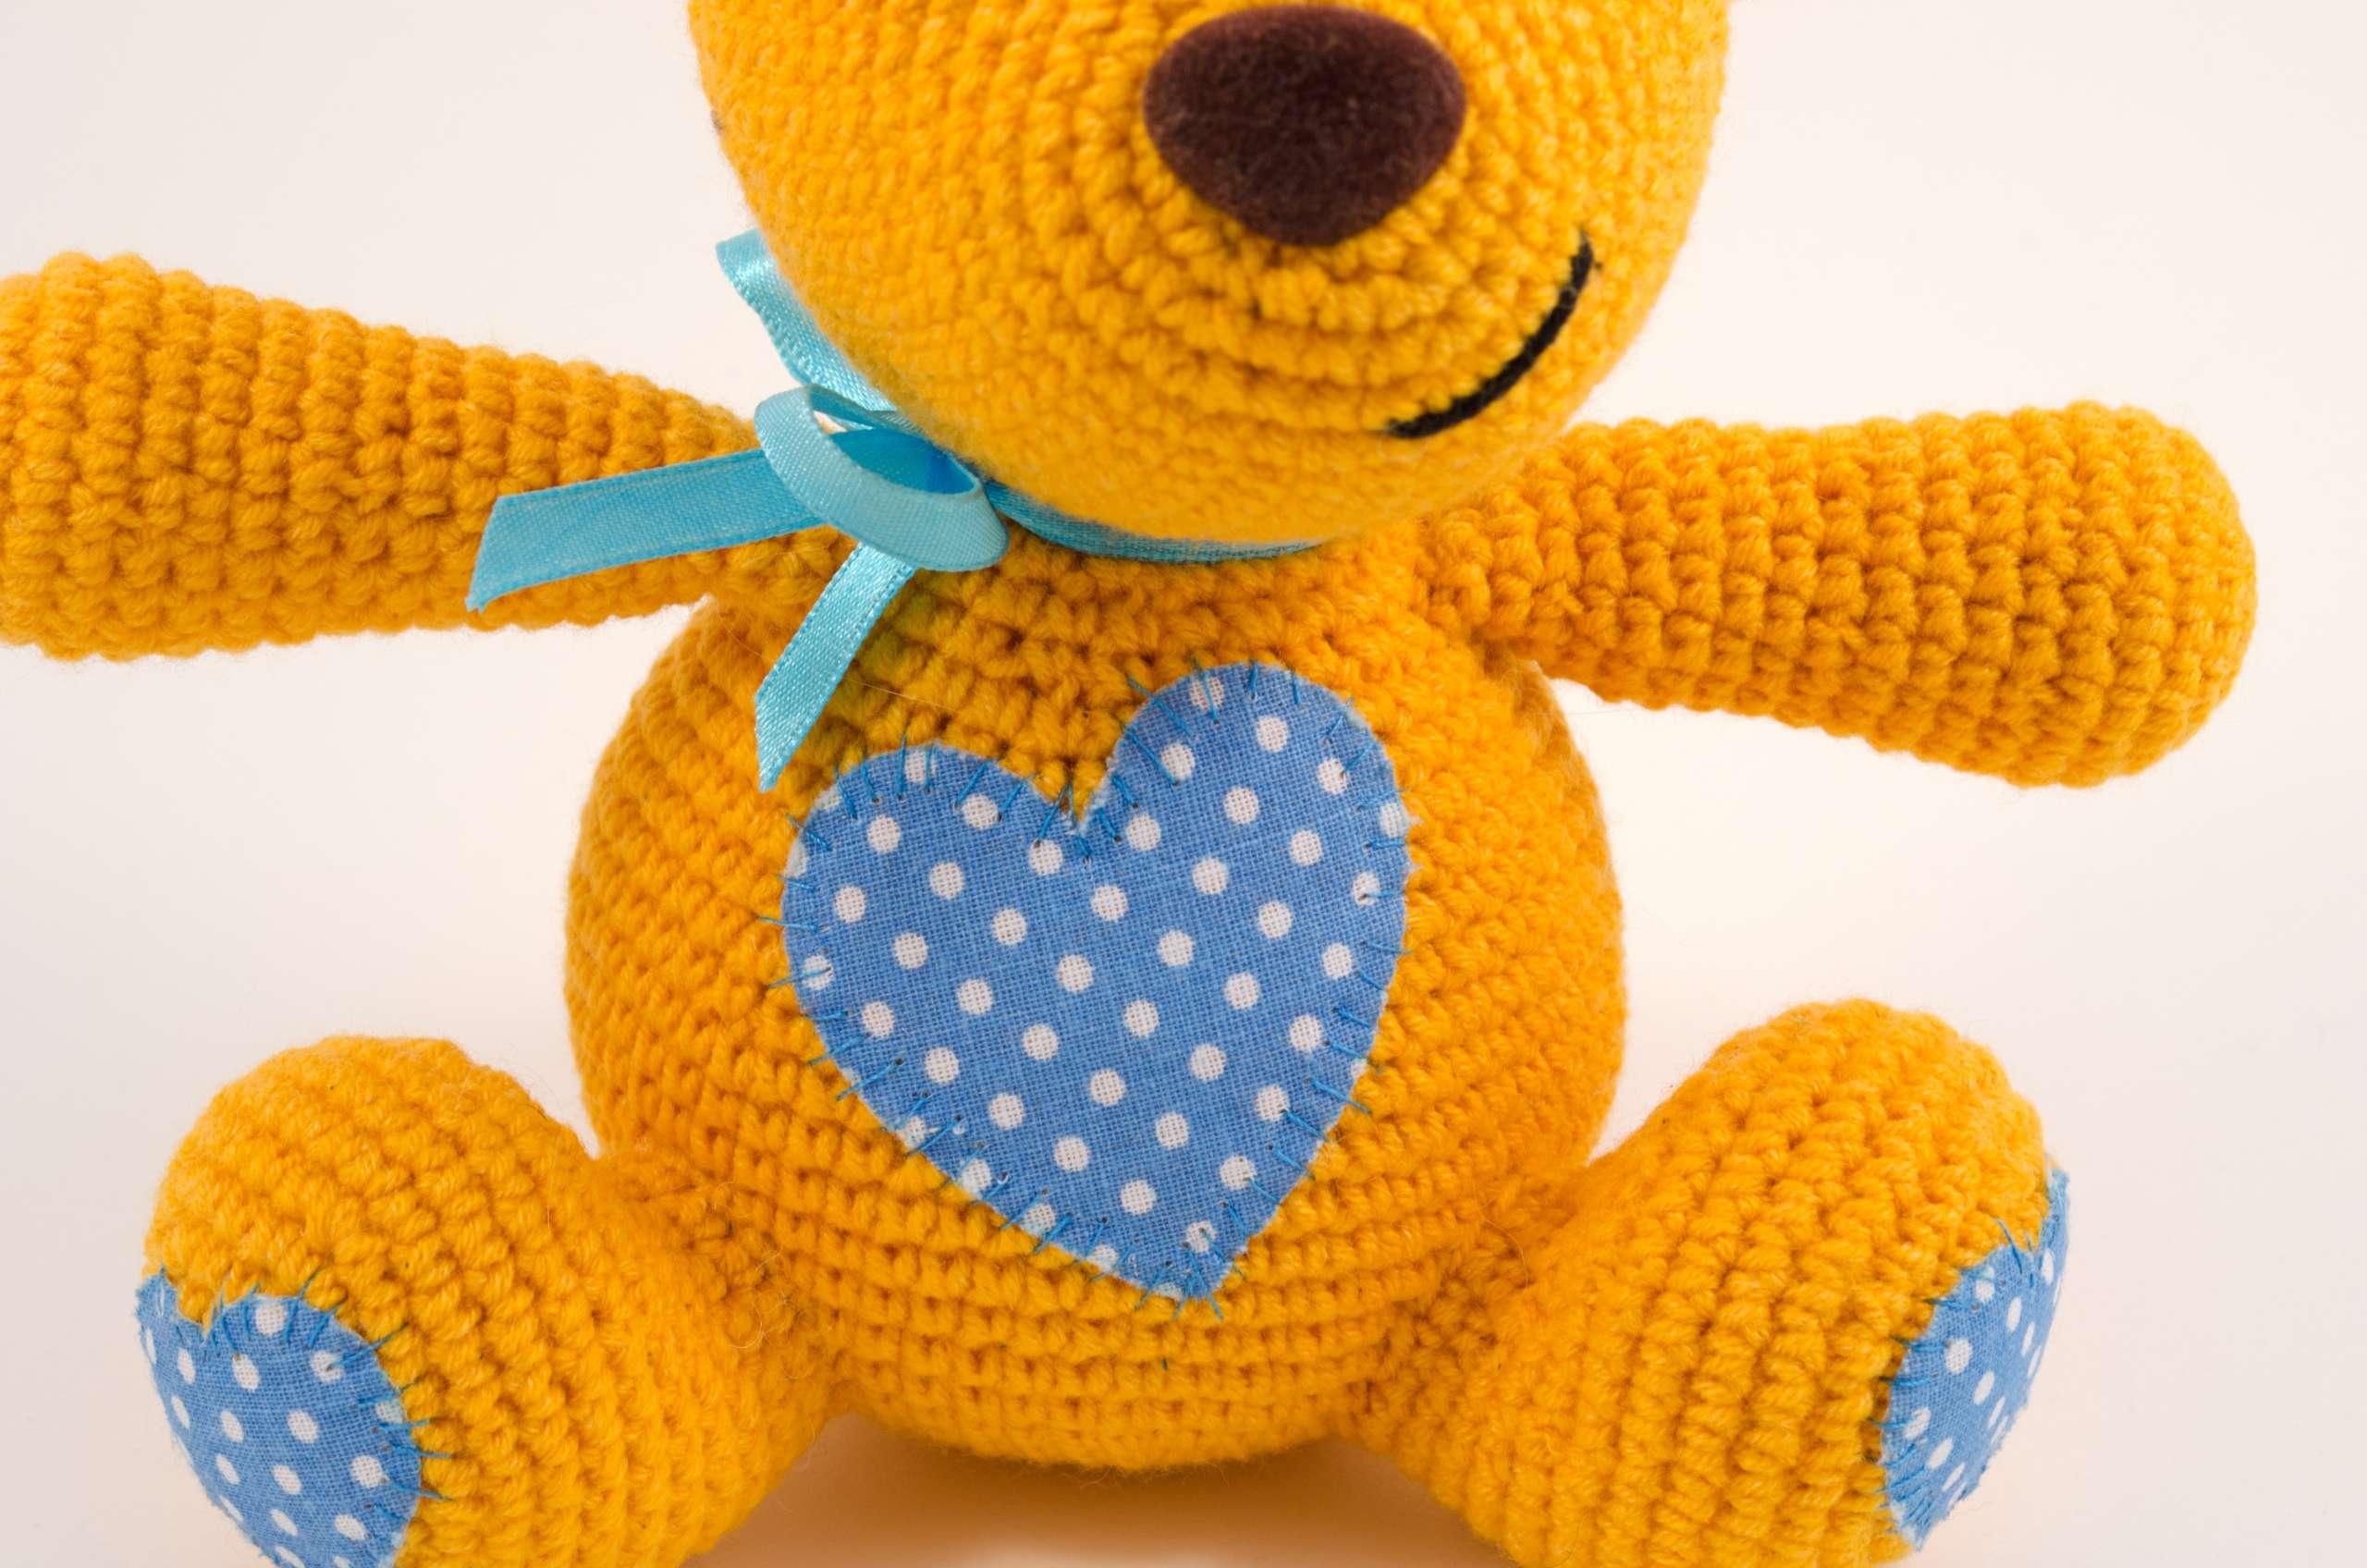 amigurumi teddy bear close up view